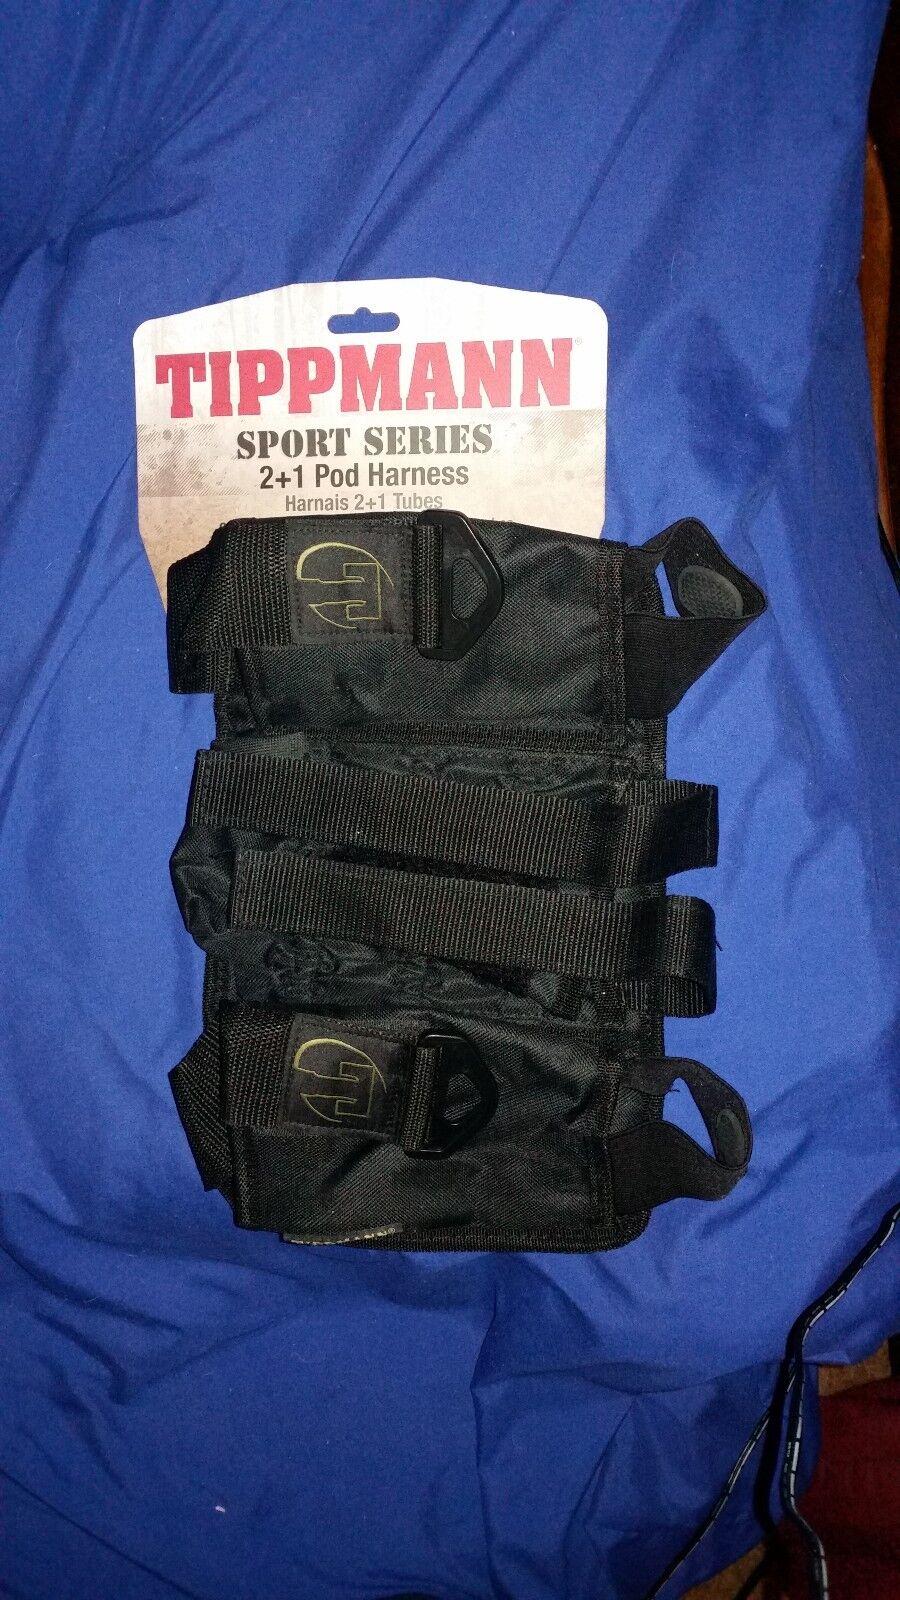 Tippmann Sport Series Paintball Pack // Harness 2+1 T399005 Black